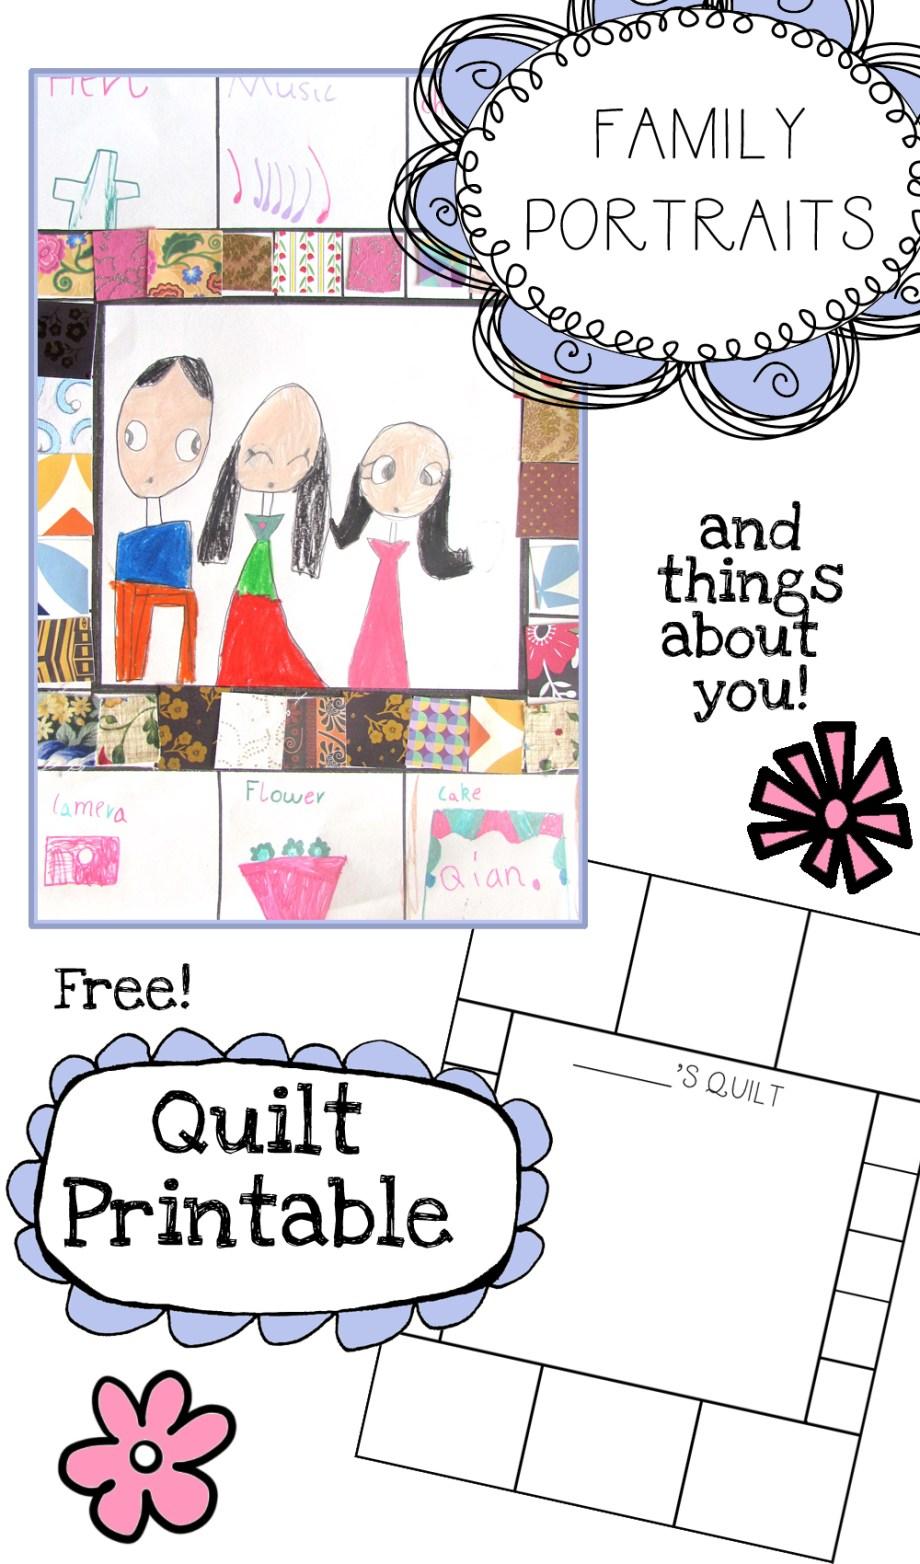 Quilt Printable